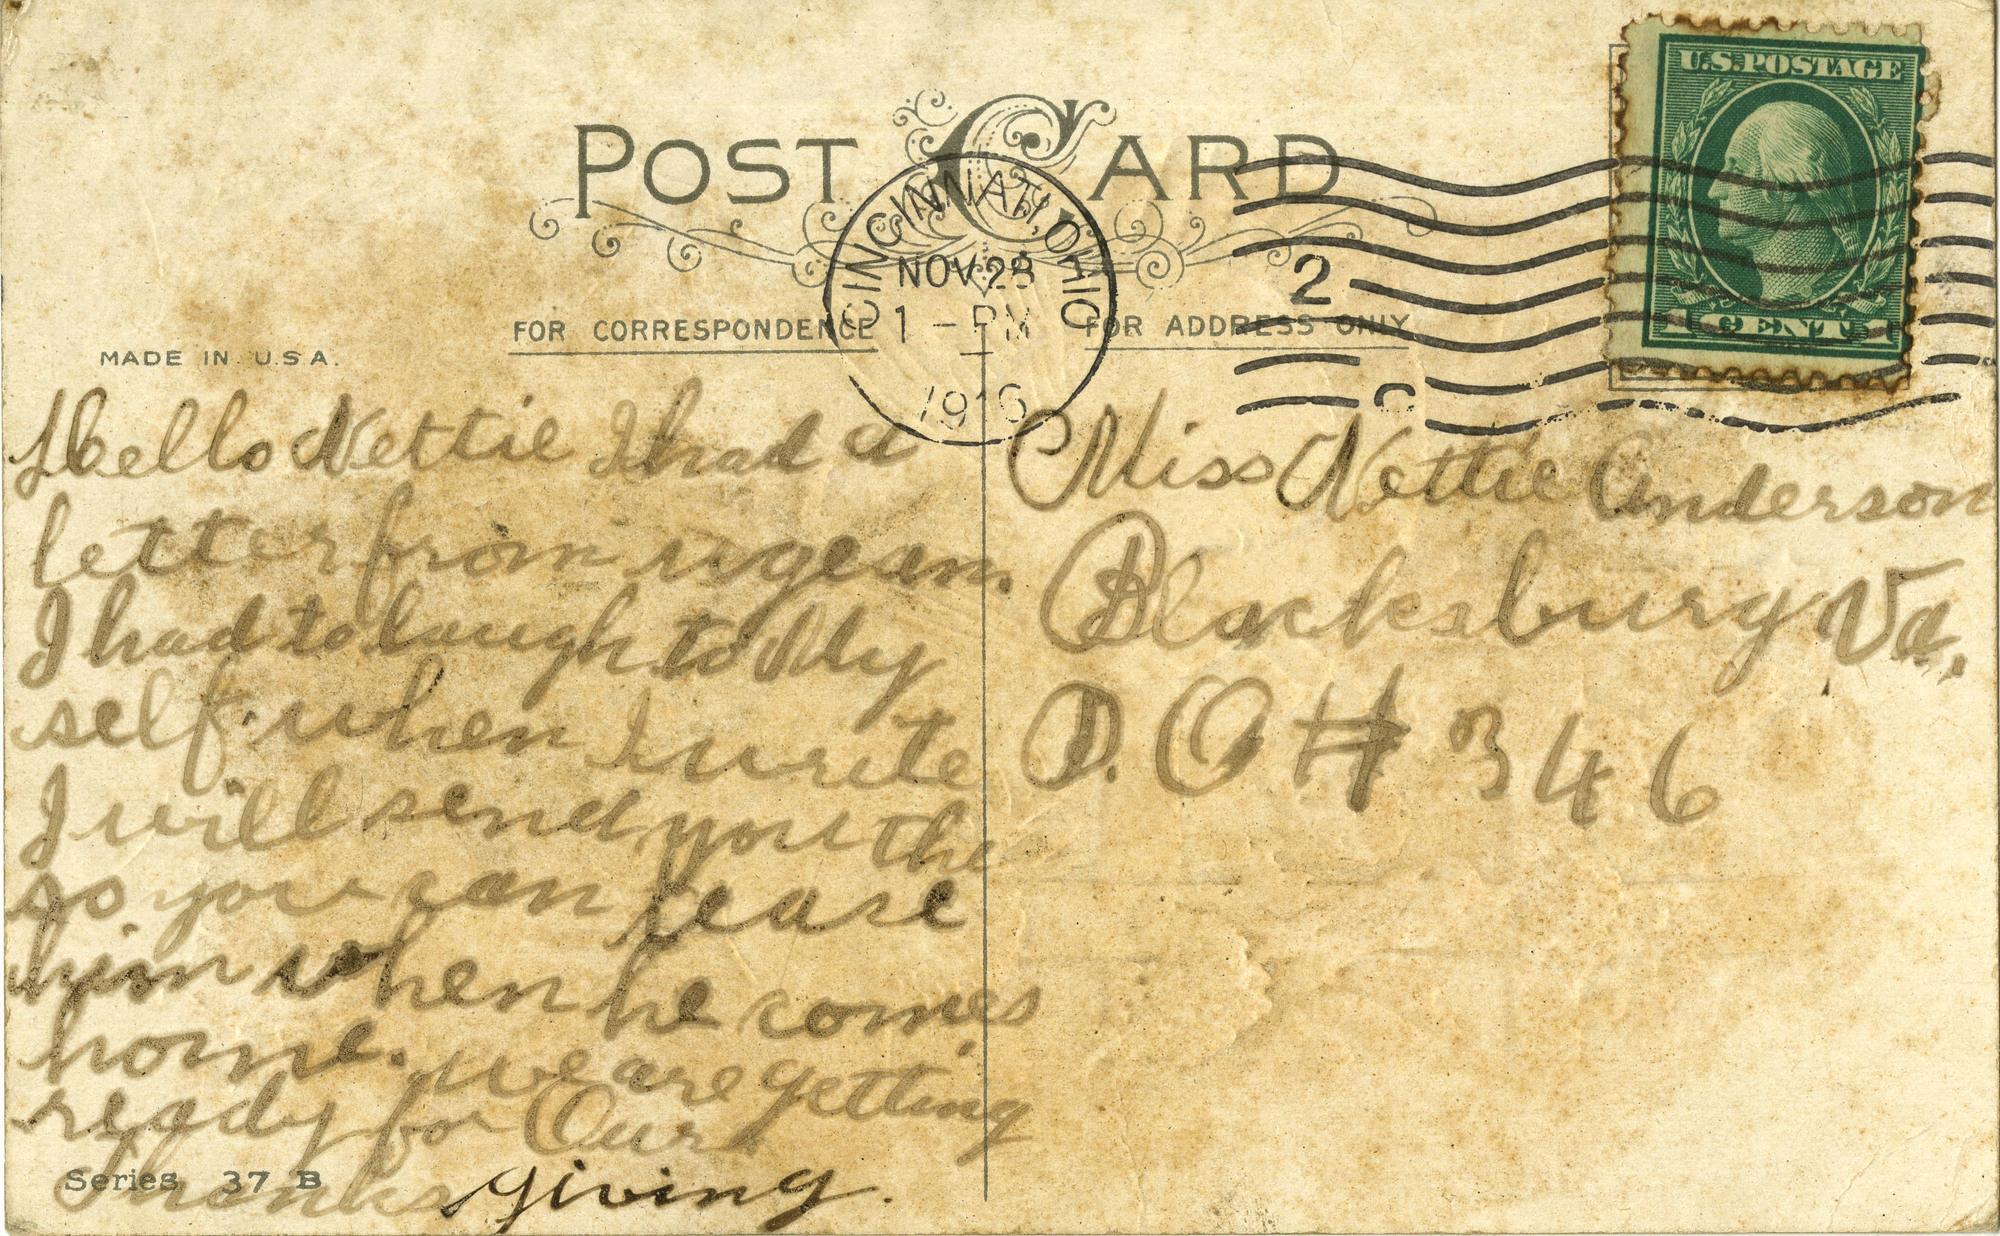 Ms1988_009_oddfellowsHouseholdOfRuthCorresp_postcard_1916_1128a.jpg